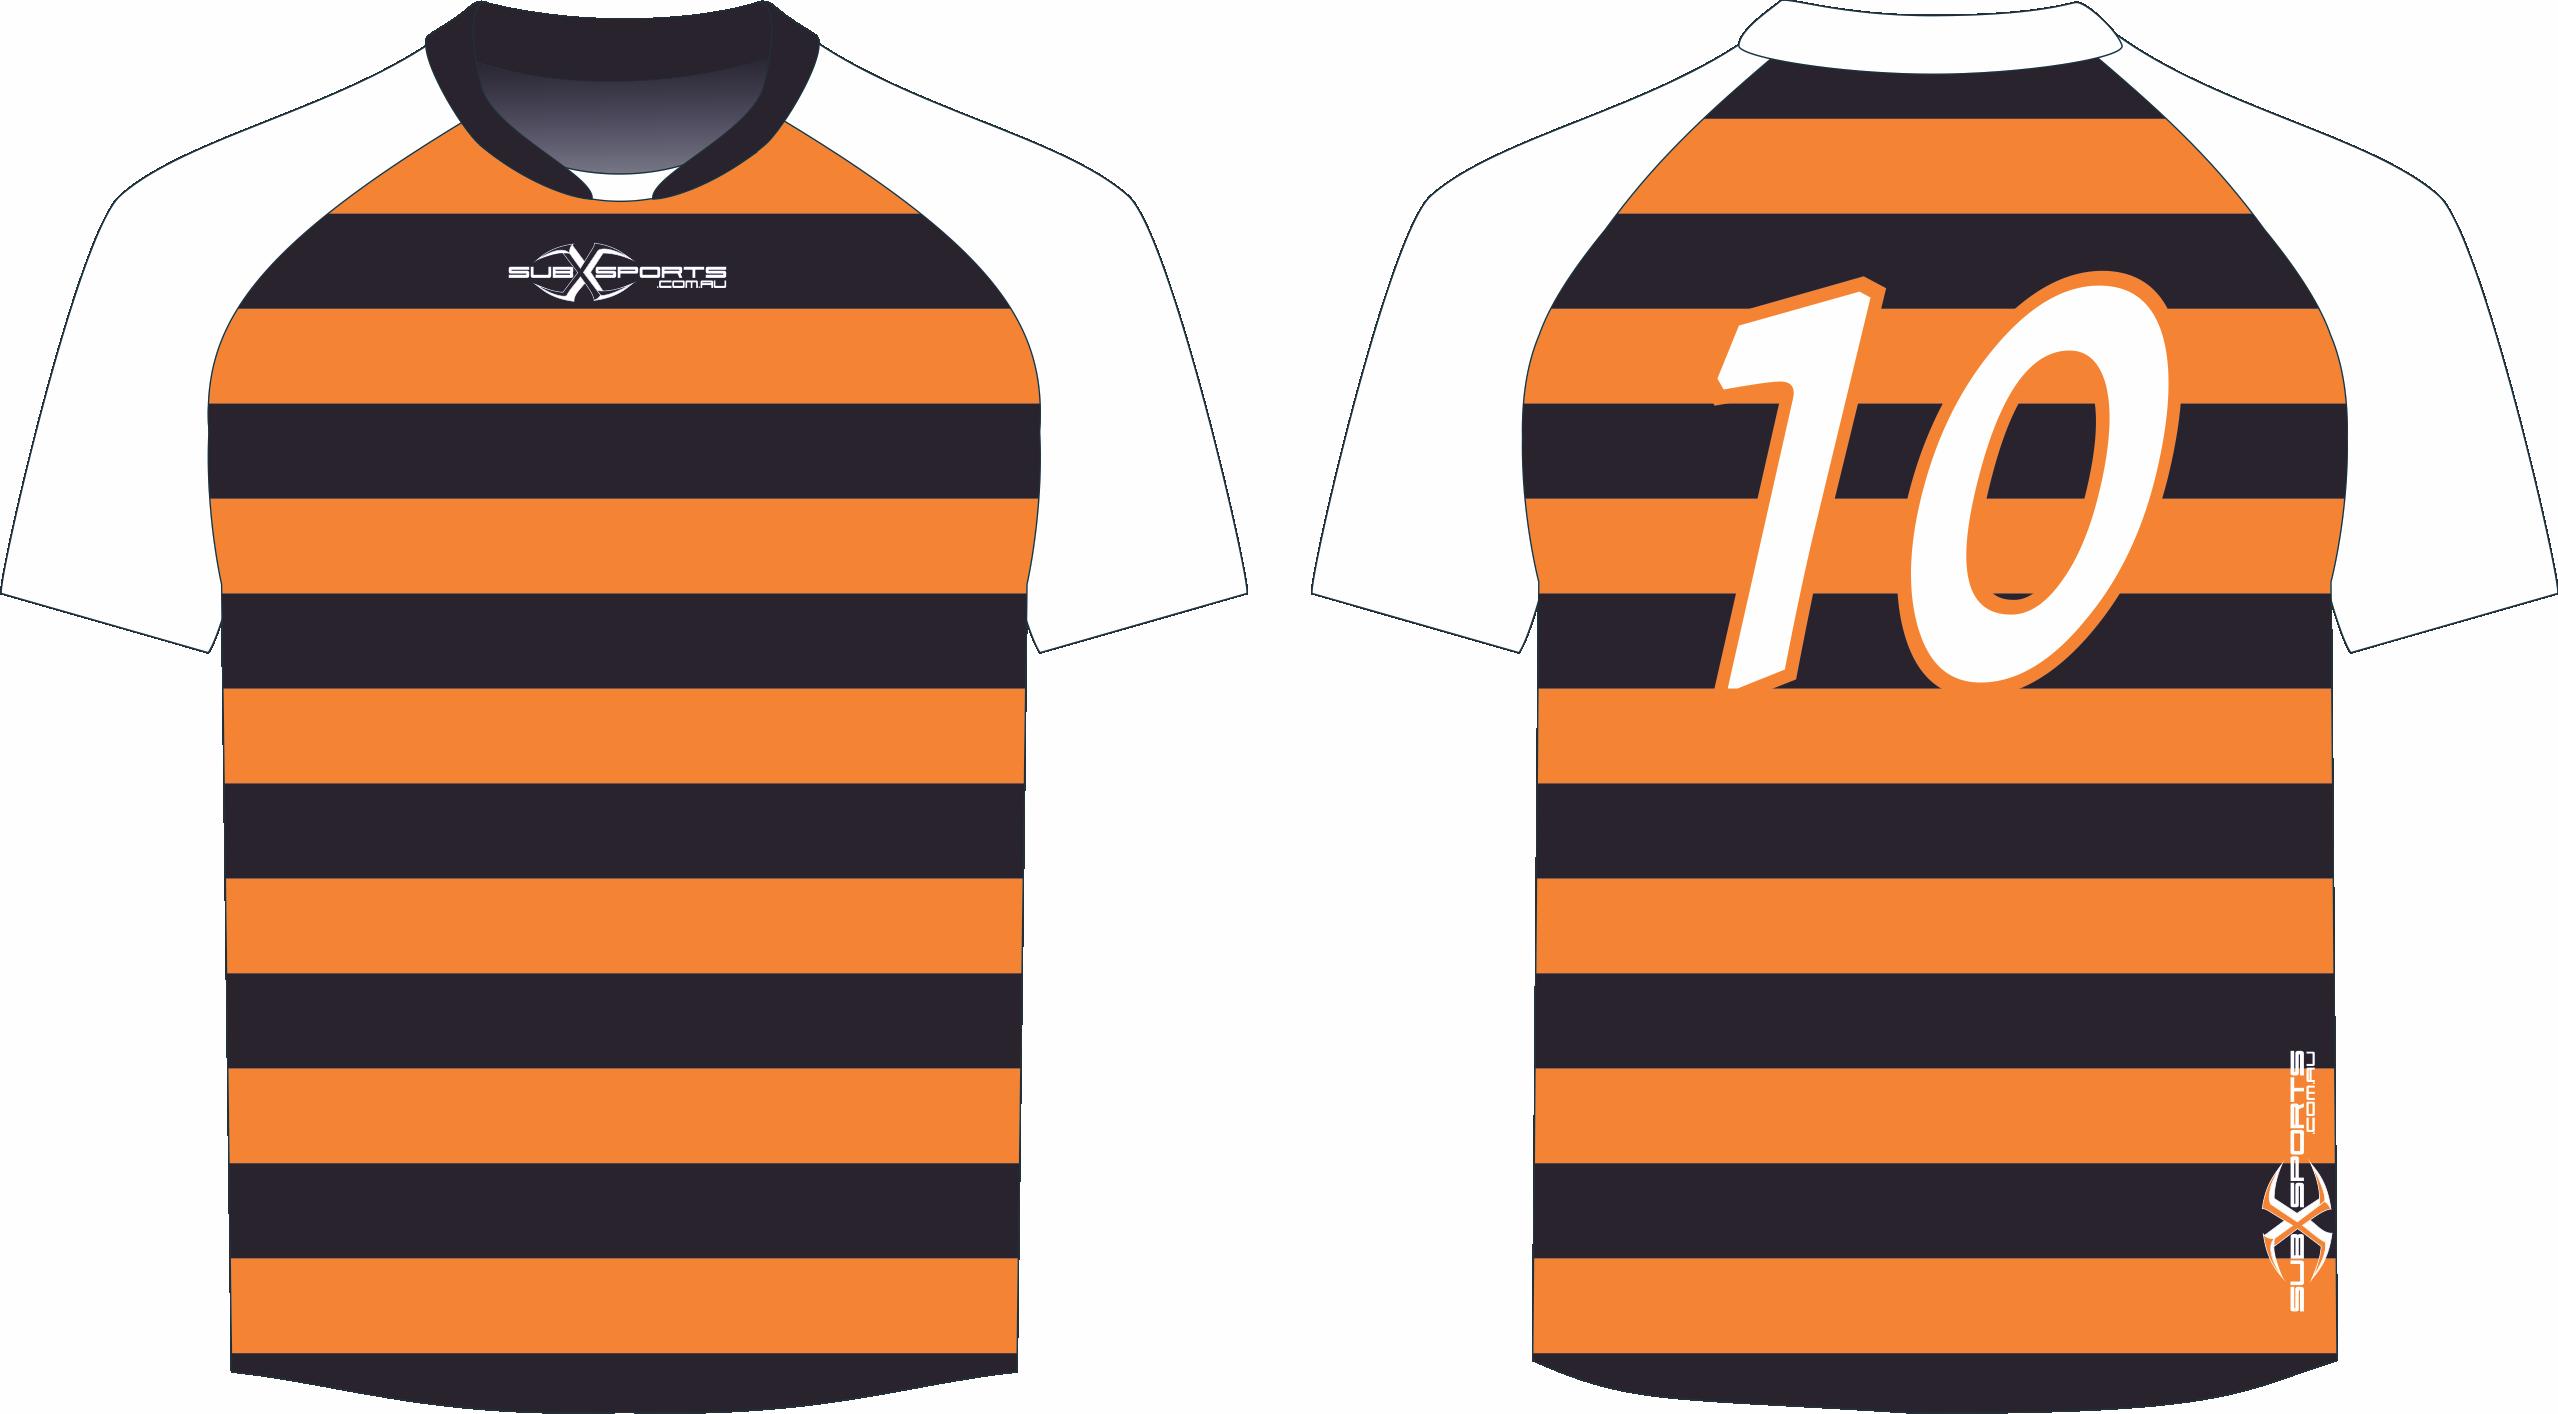 S202XJ Jersey Black Orange White.png